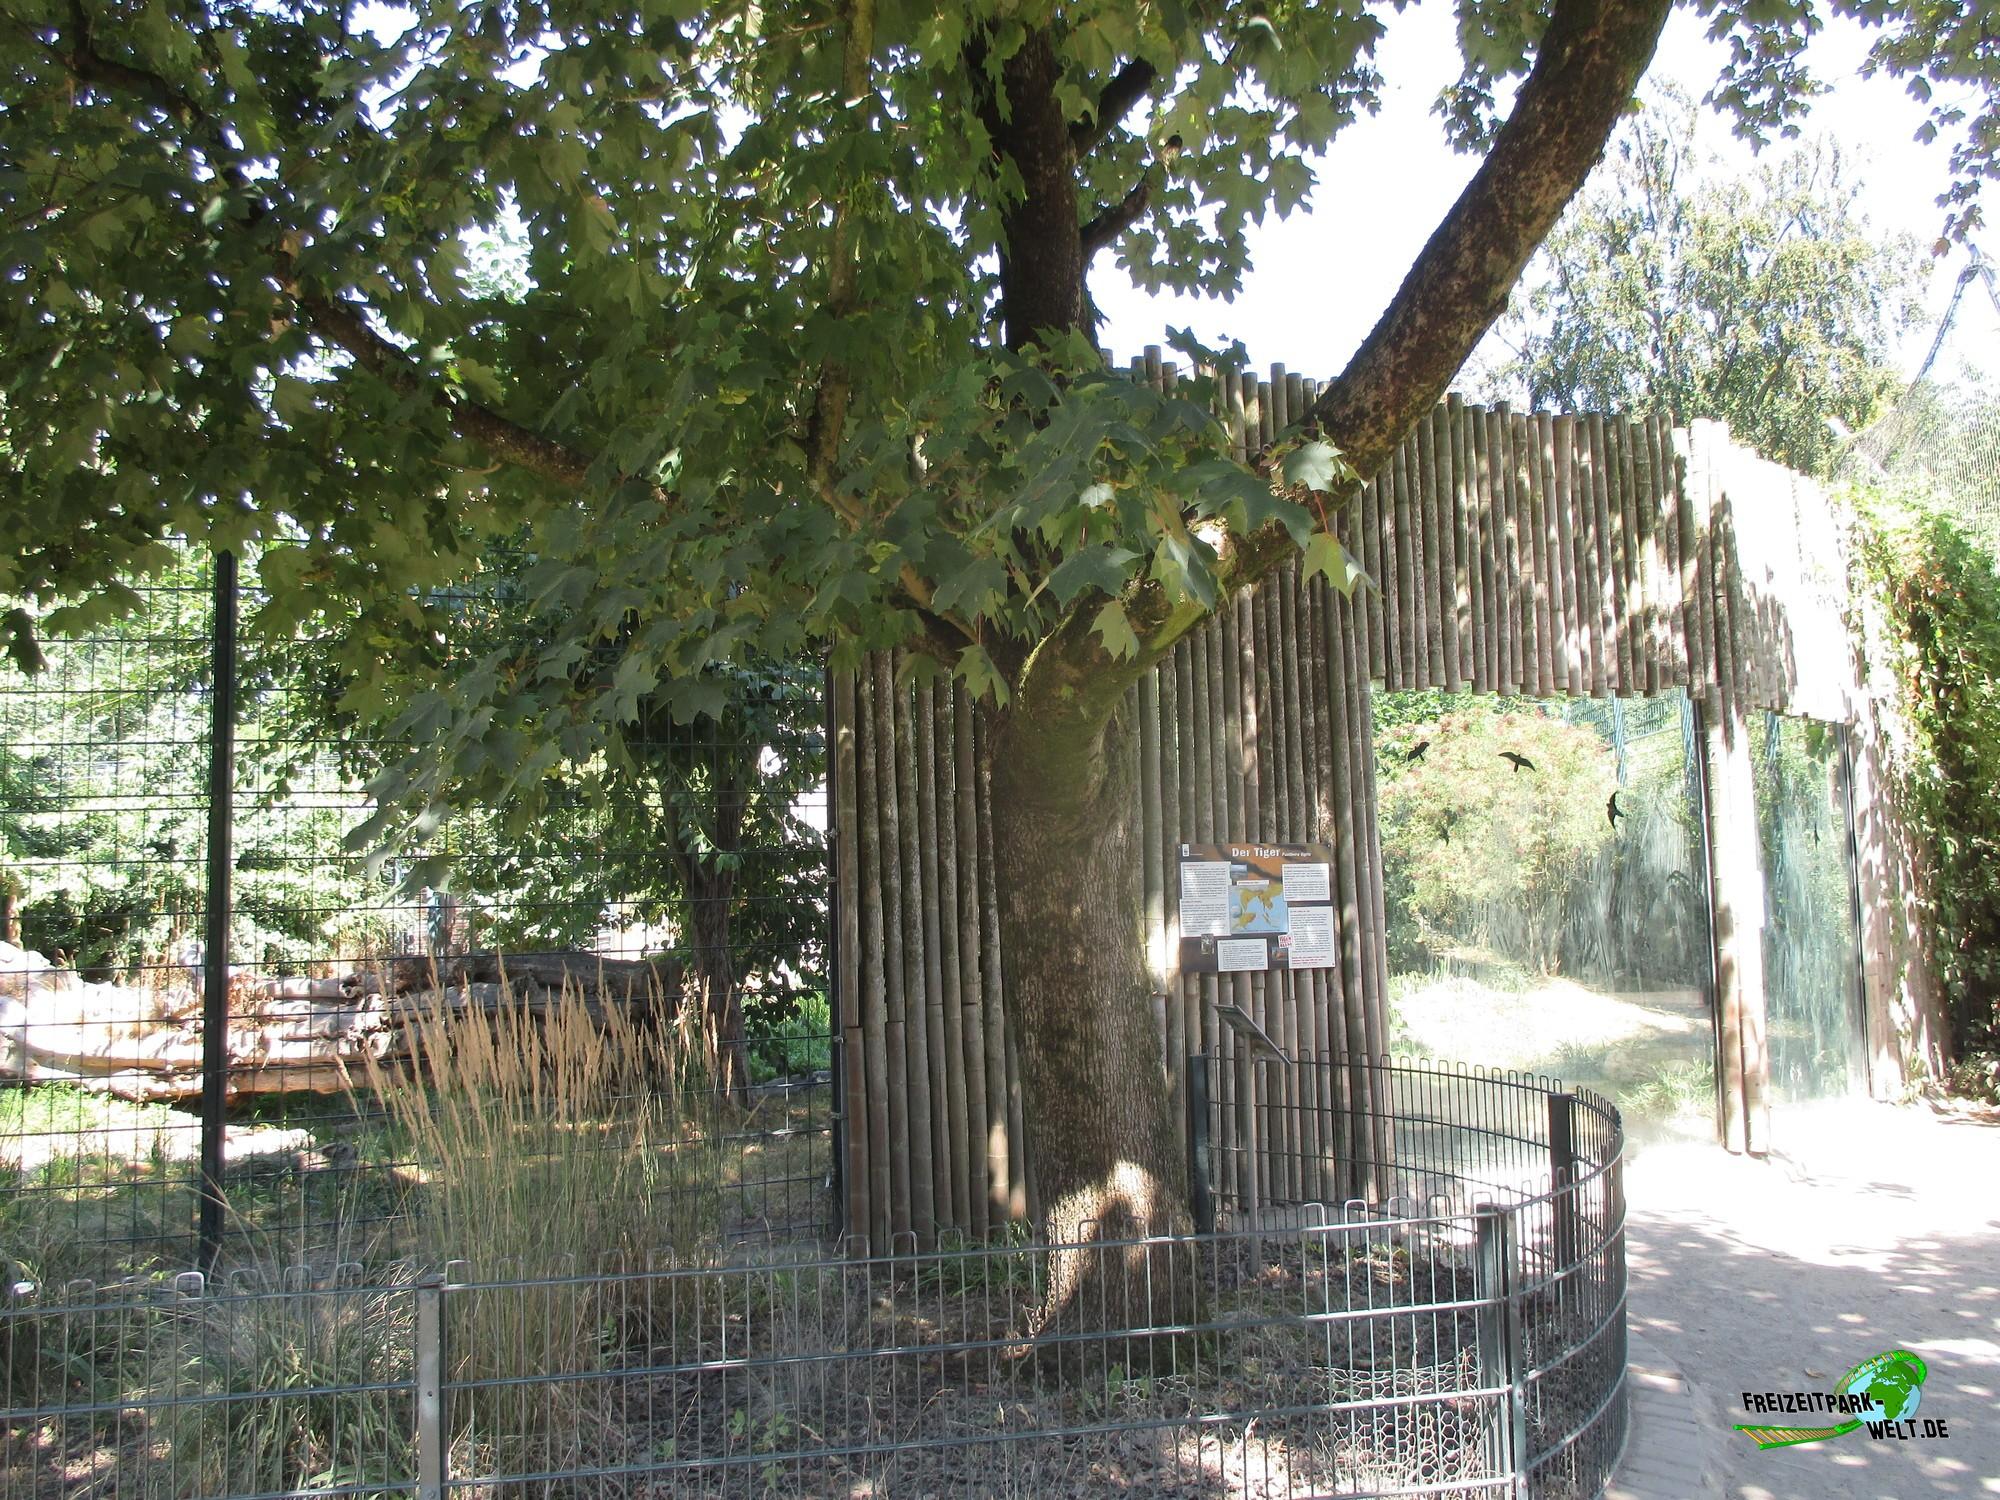 sumatra tiger zoo krefeld freizeitpark. Black Bedroom Furniture Sets. Home Design Ideas